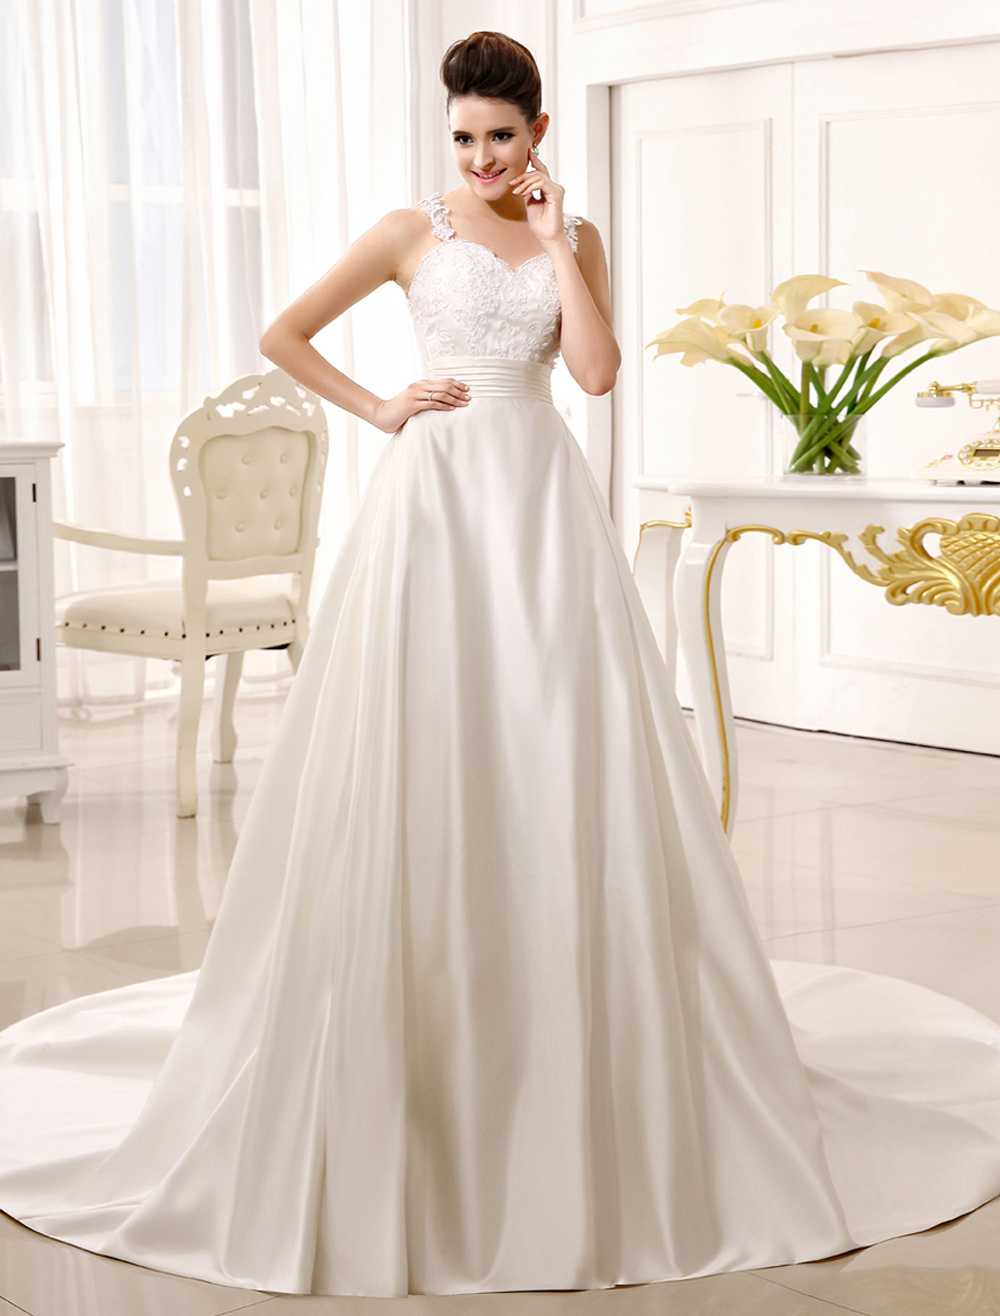 Ivory A-line Sweetheart Neck Spaghetti Strap Pleated Wedding Dress